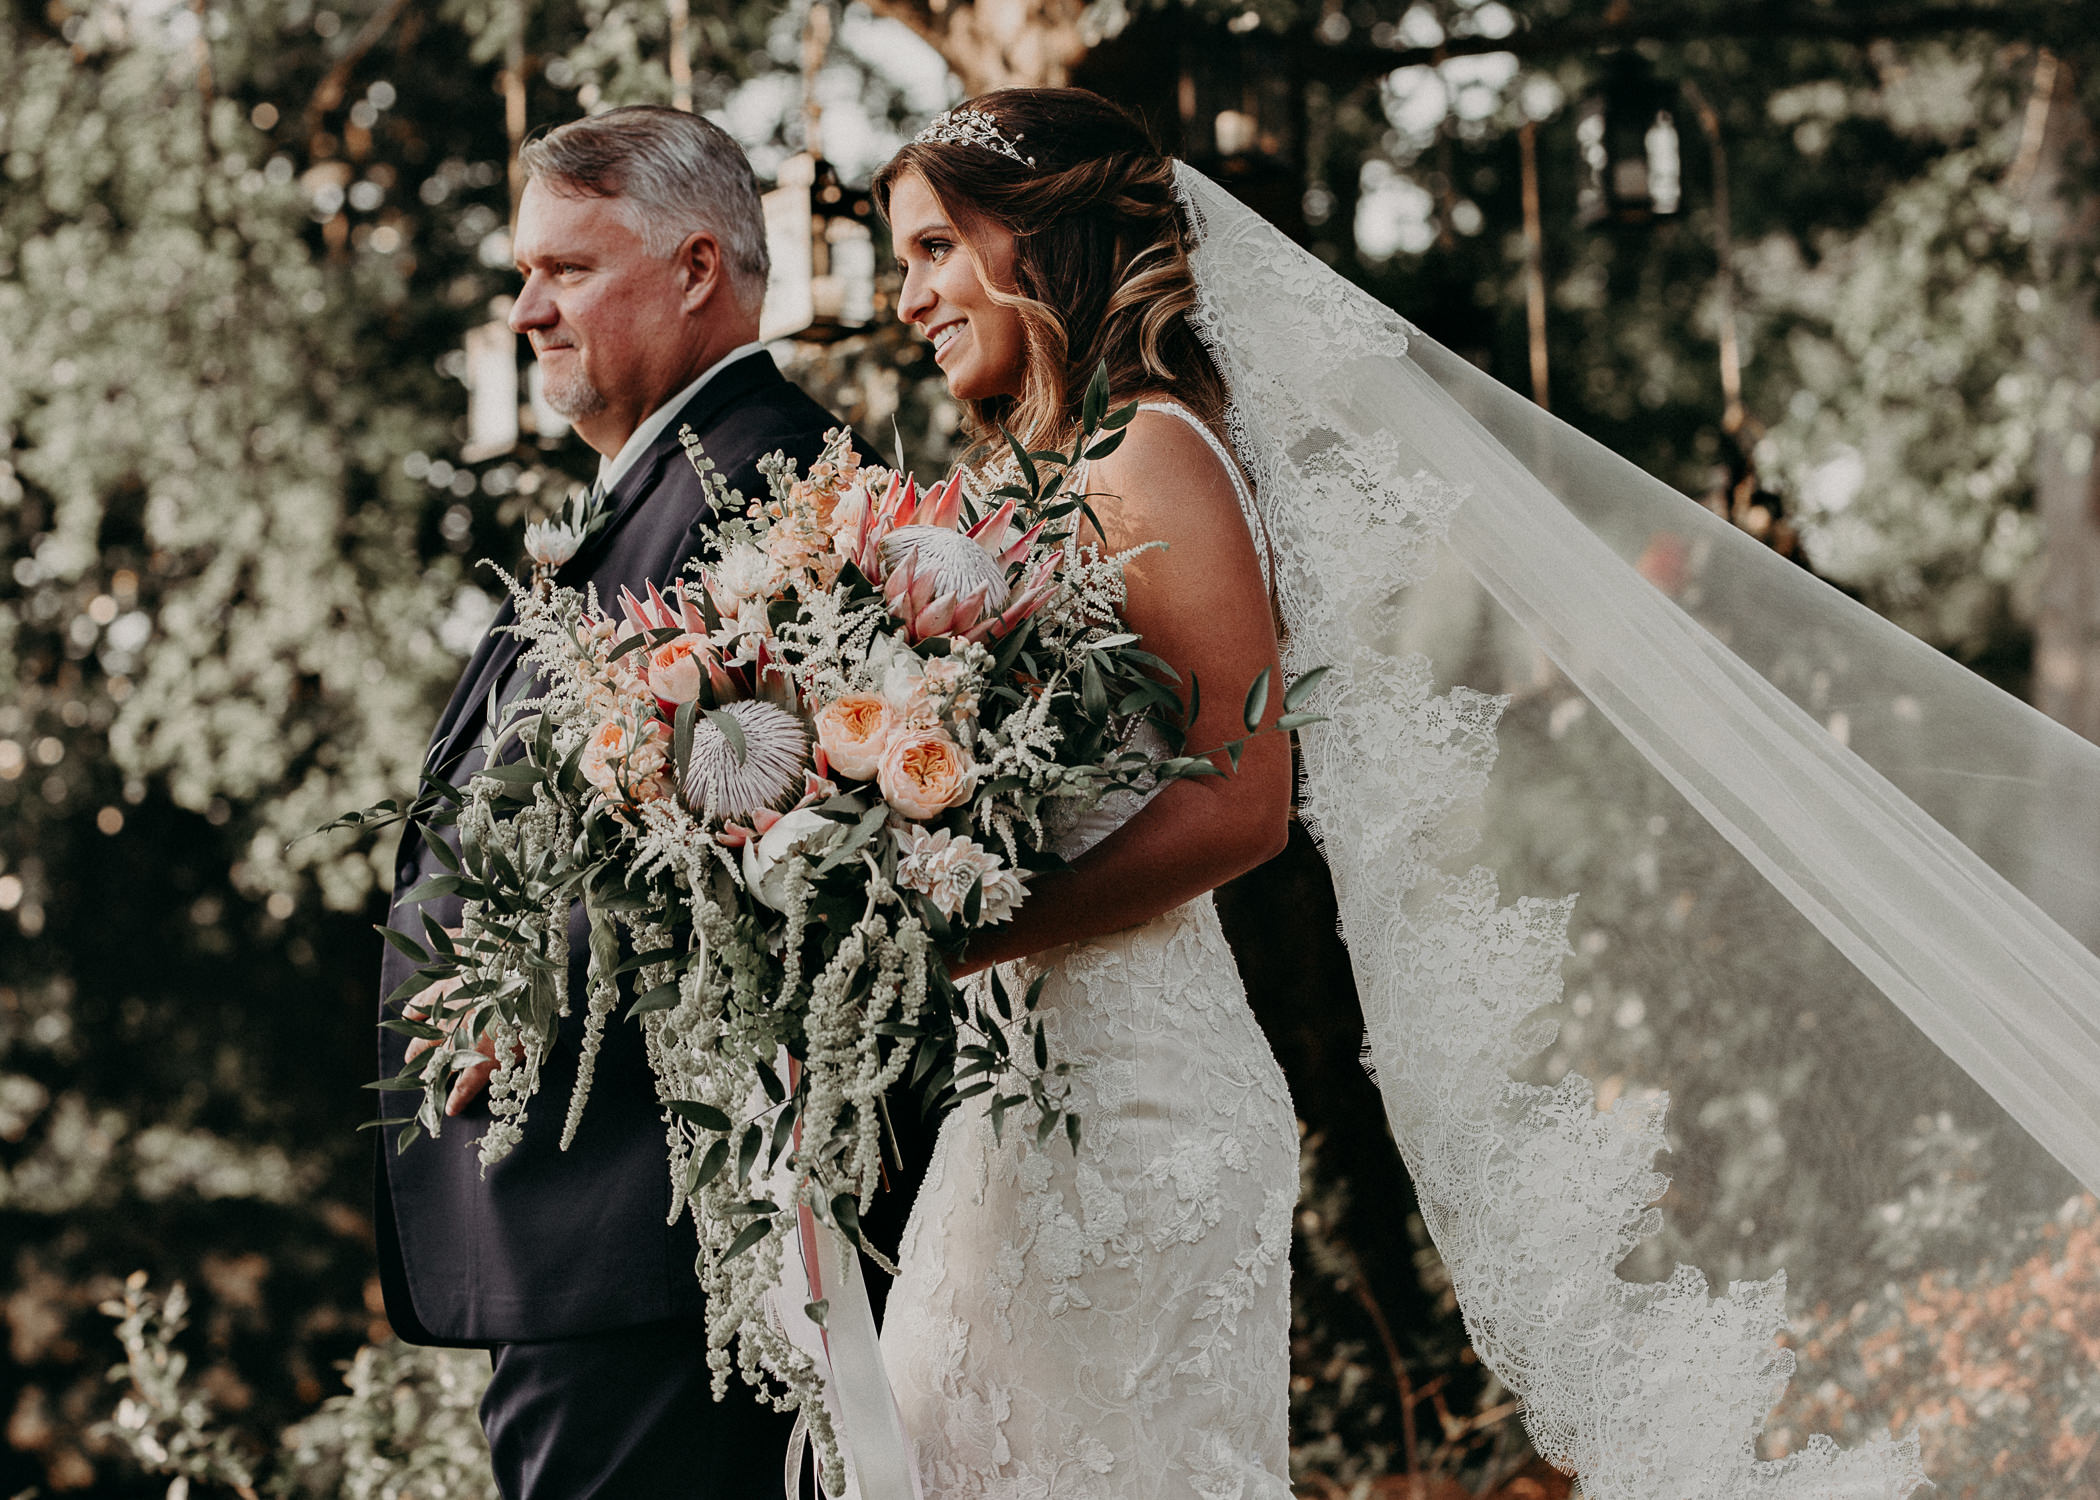 68Carl House Wedding Venue Ga, Atlanta Wedding Photographer - Boho, Bohemian, Junebug Weddings, Vintage, Retro, Trendy. Aline Marin Photography. .jpg